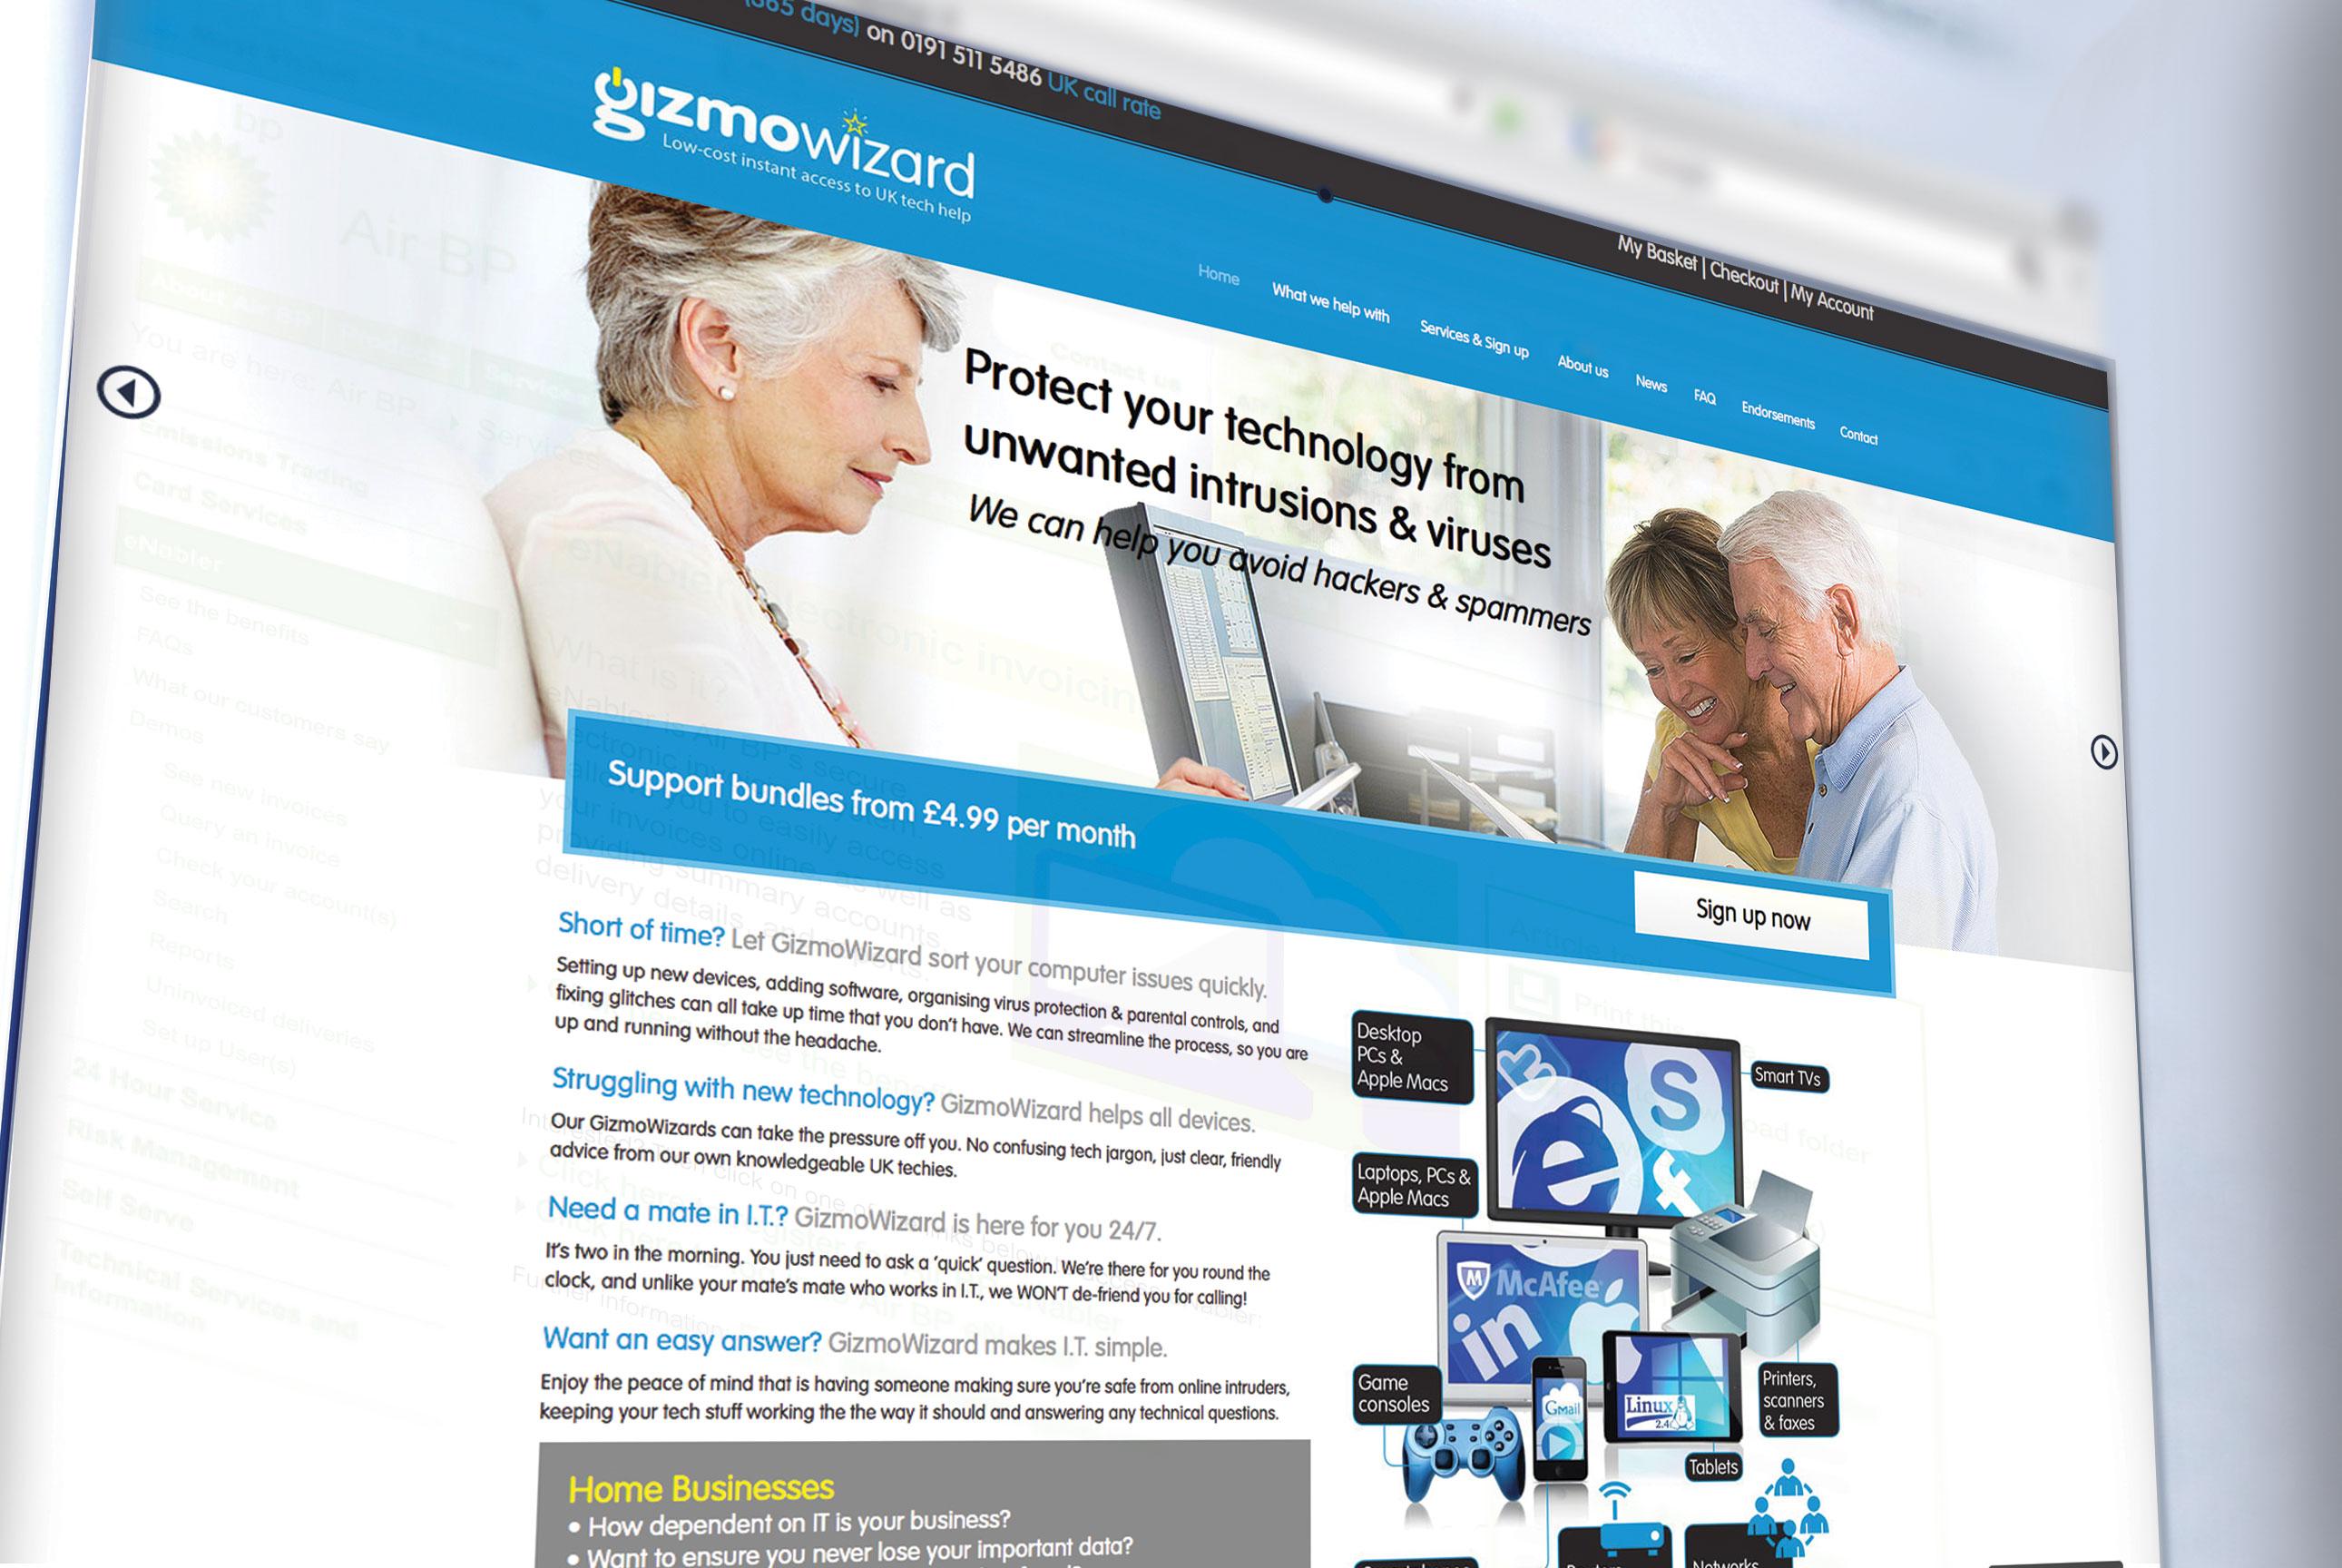 Branding and marketing Gizmowizard